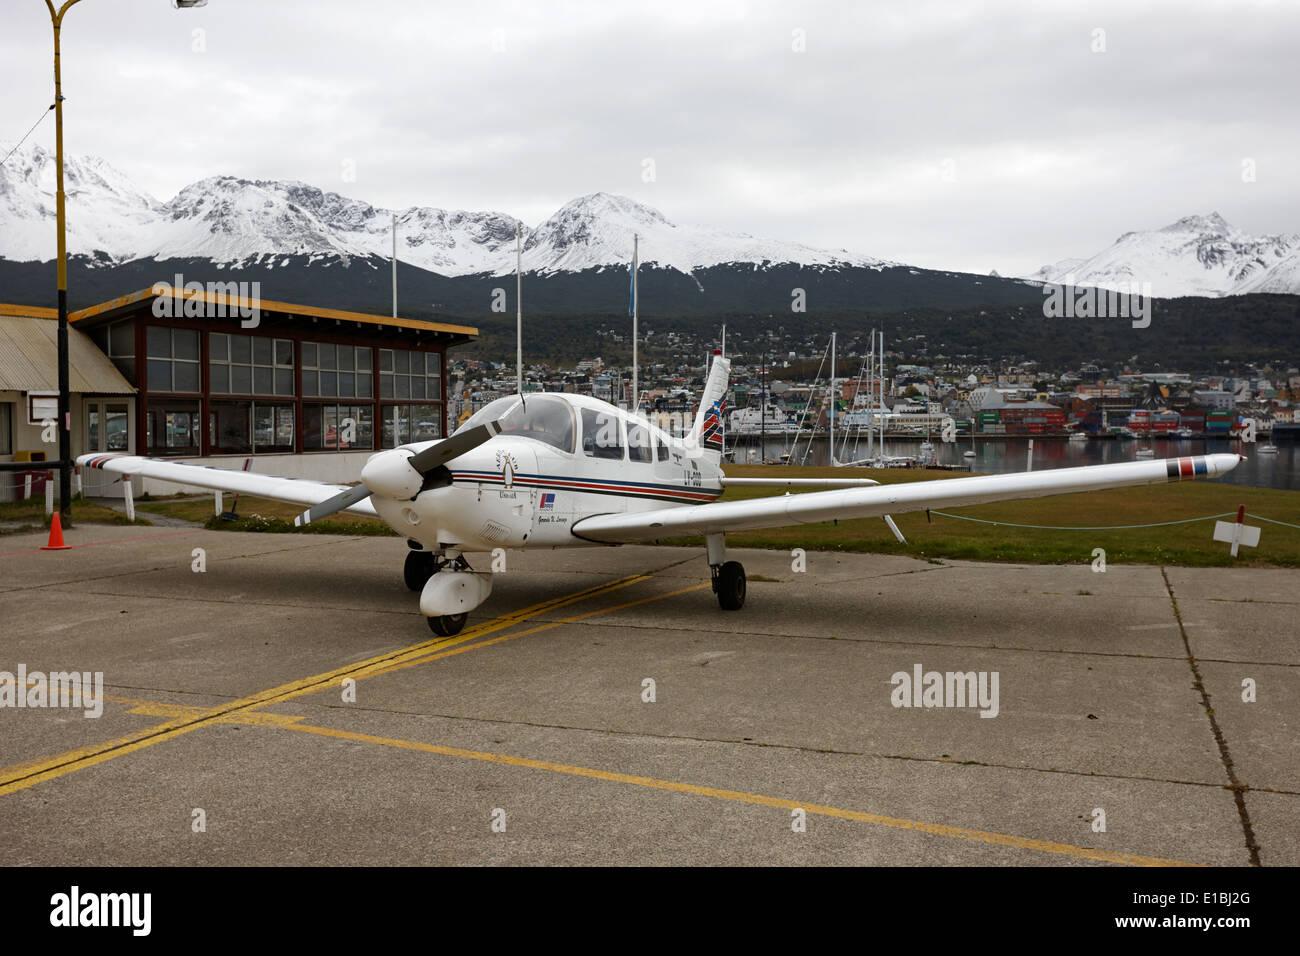 Lv-00d piper pa28-181 archer aeromobili leggeri aeroclub Ushuaia Argentina Foto Stock